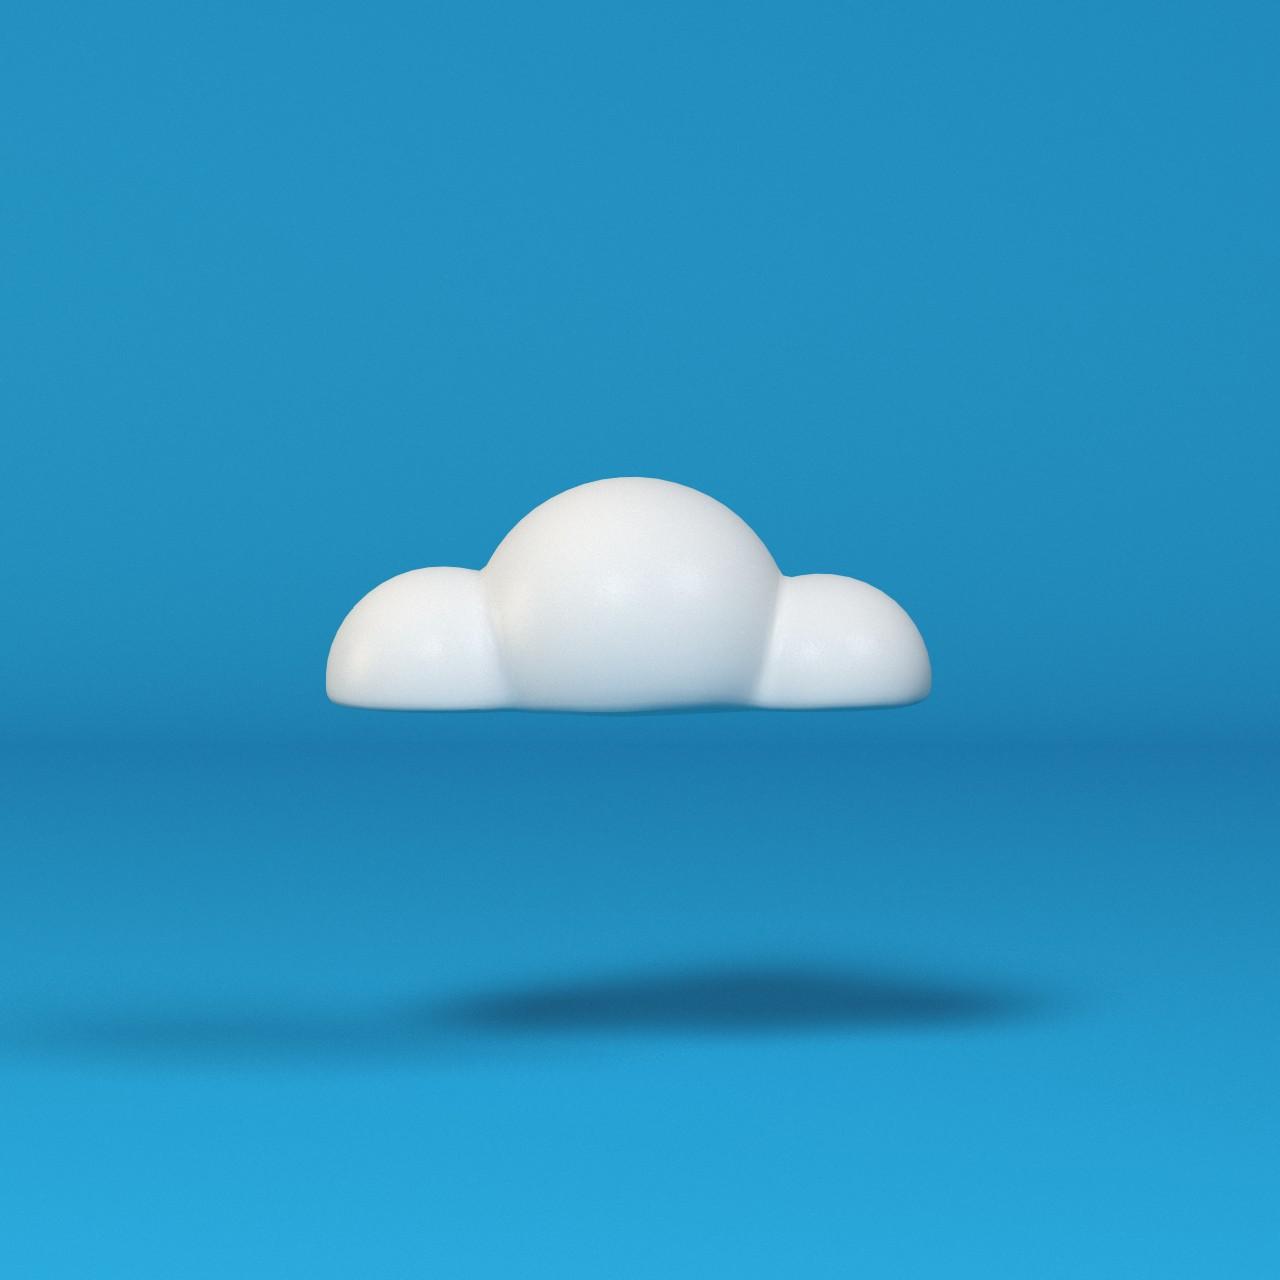 flat_cloud_5_1.jpg